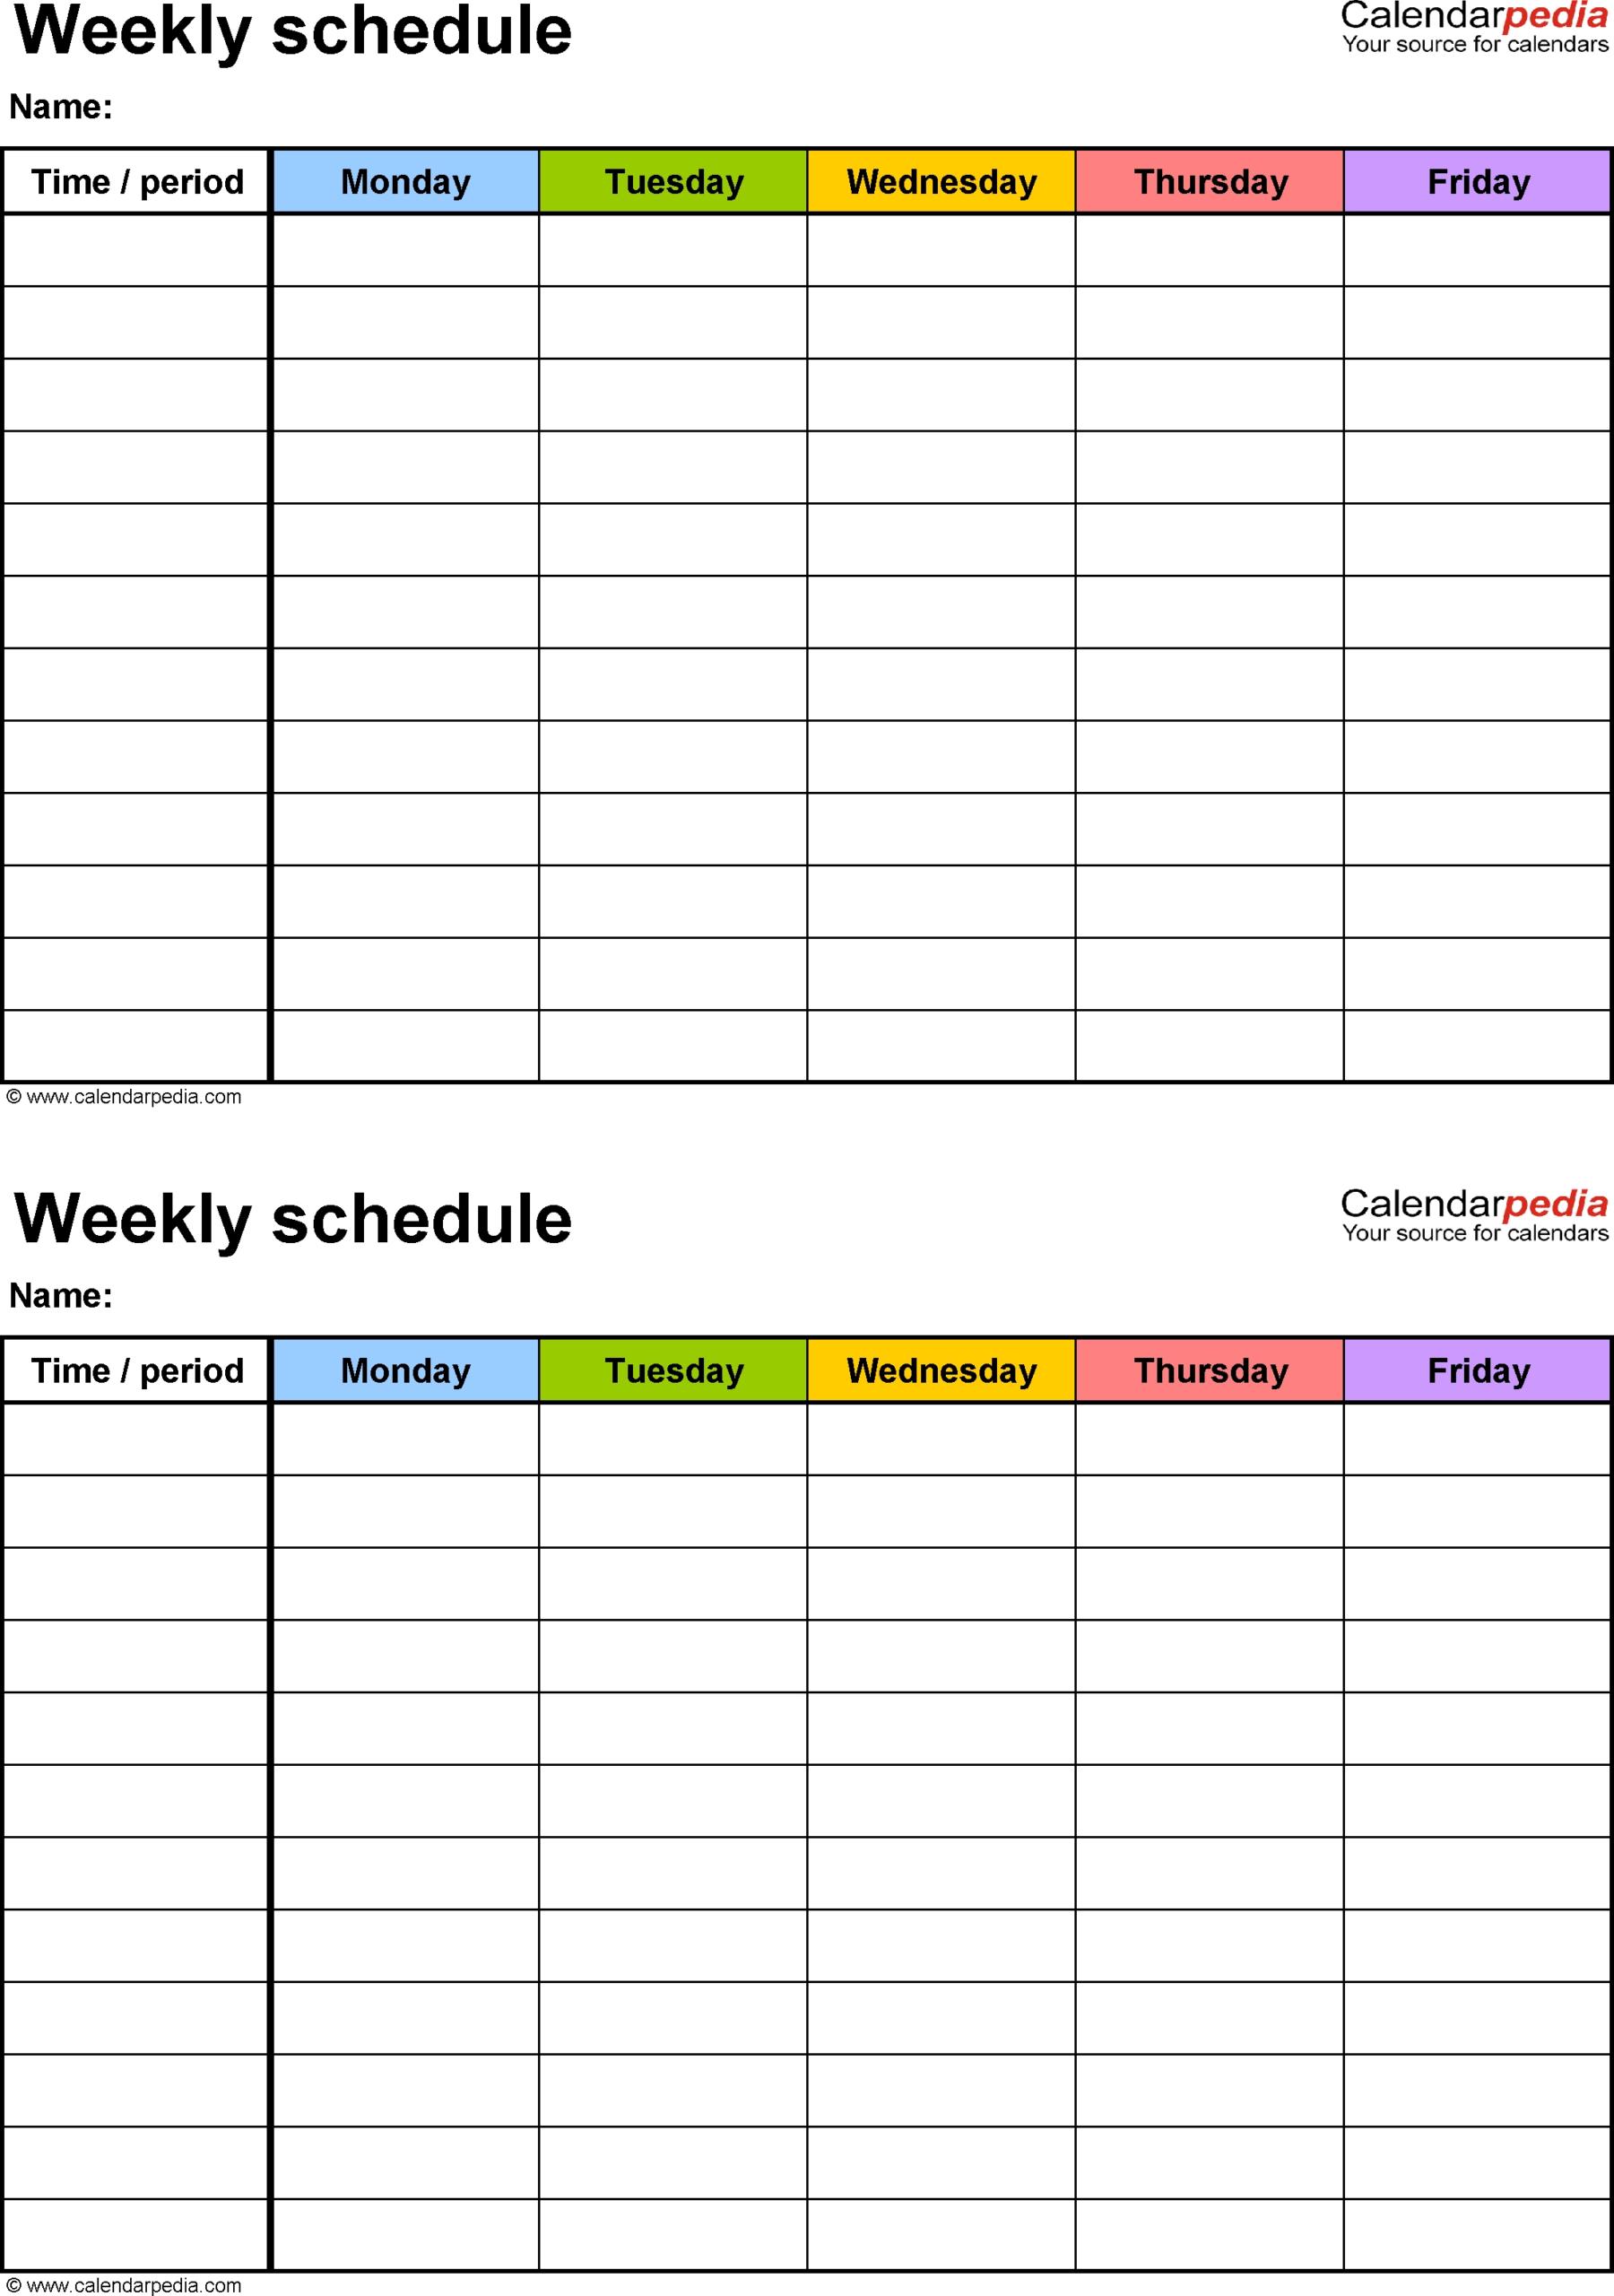 5 Day Monthly Calendar Printable | Calendar Template Printable with regard to 5 Day Calendar Template Word